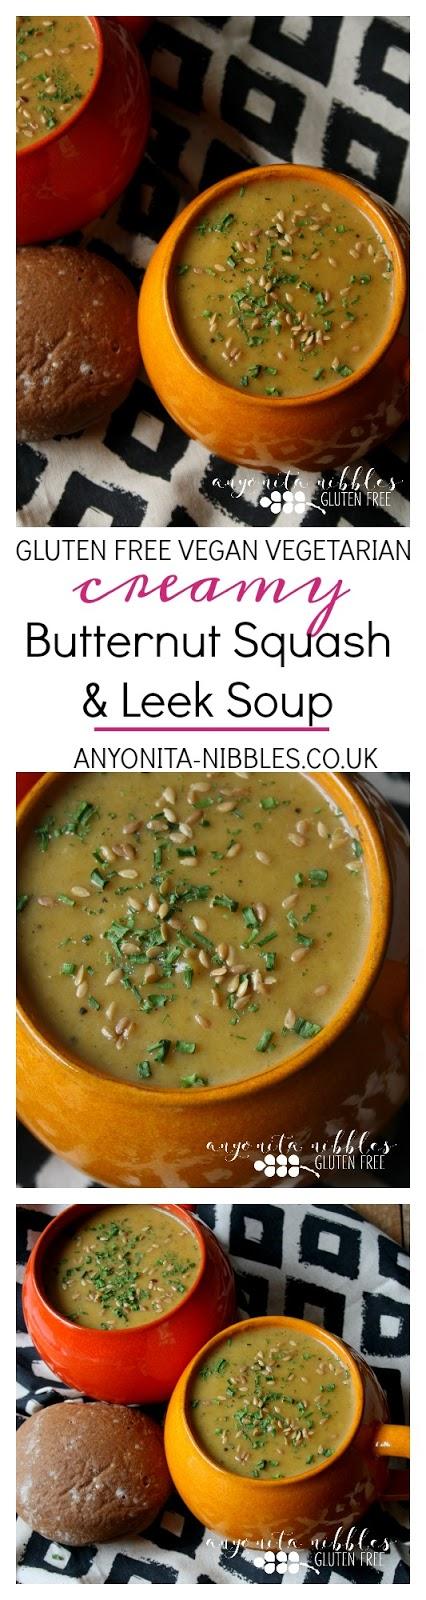 Gluten Free Vegan Vegetarian Creamy Butternut Sqush & Leek Soup | Anyonita Nibbles